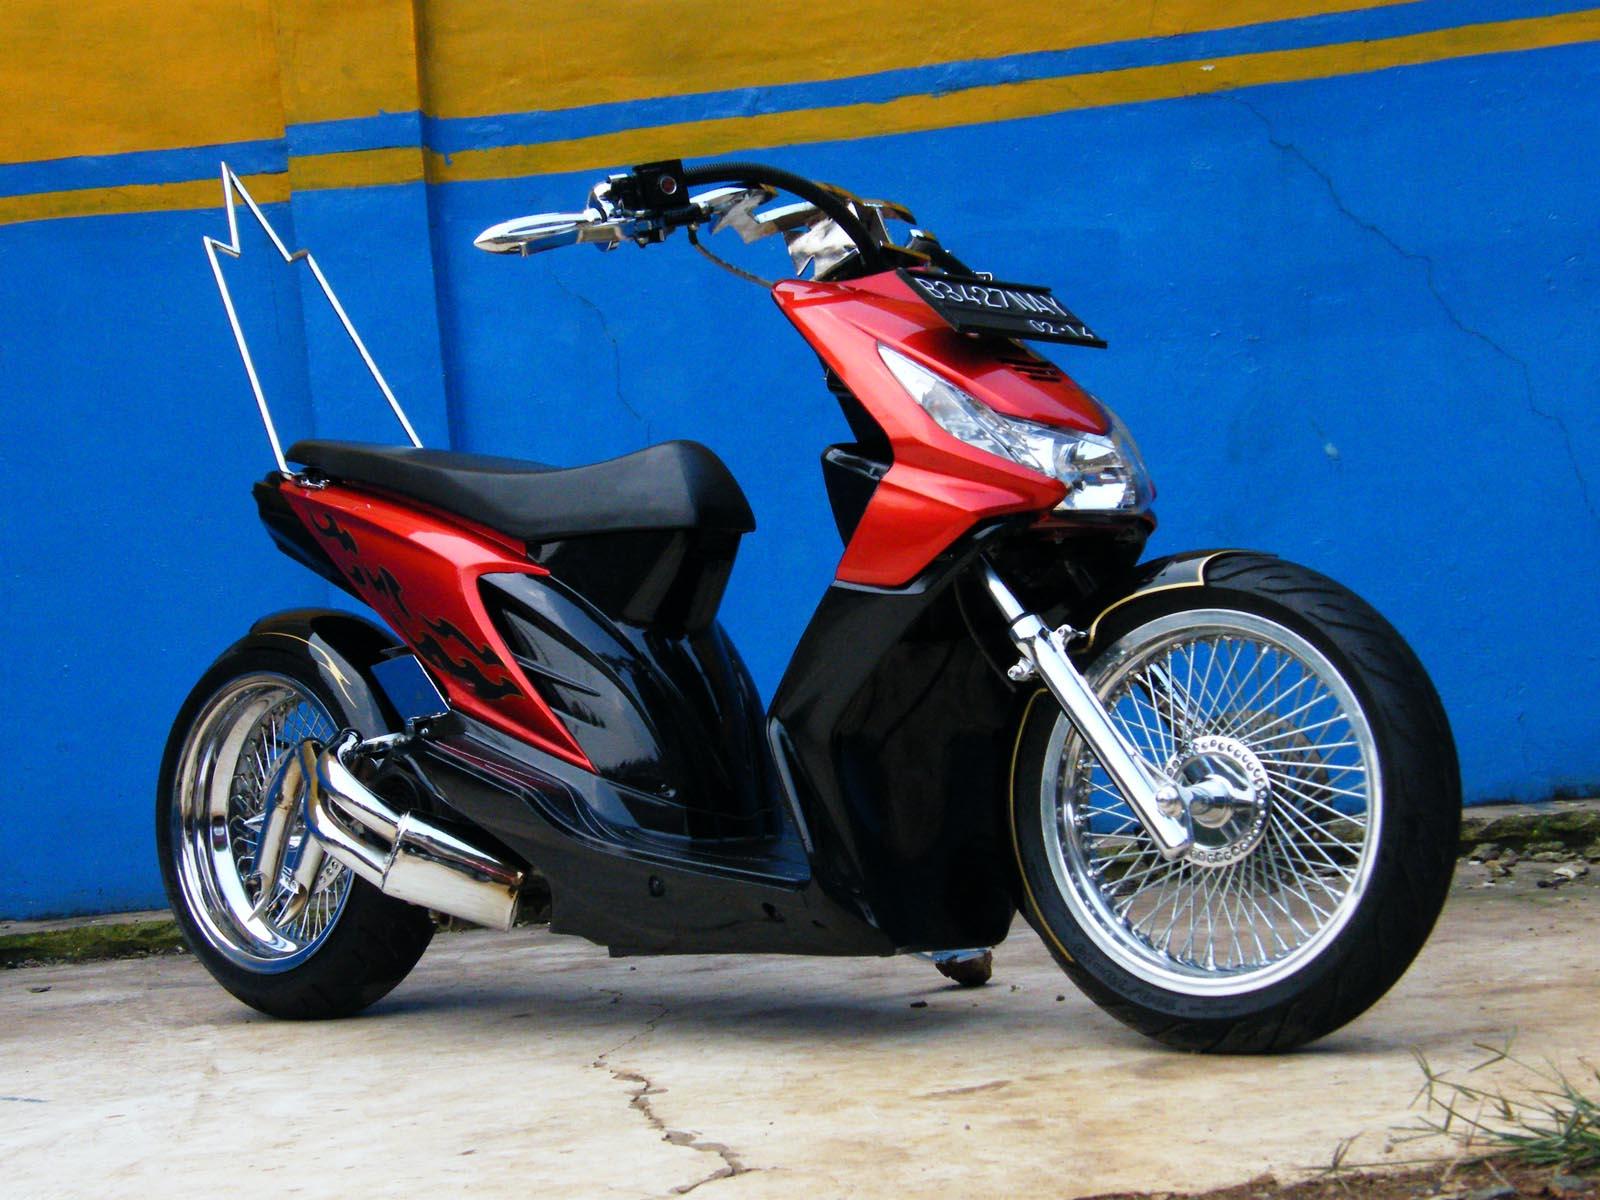 Modifikasi Motor Mio Jadi Harley Pecinta Modifikasi